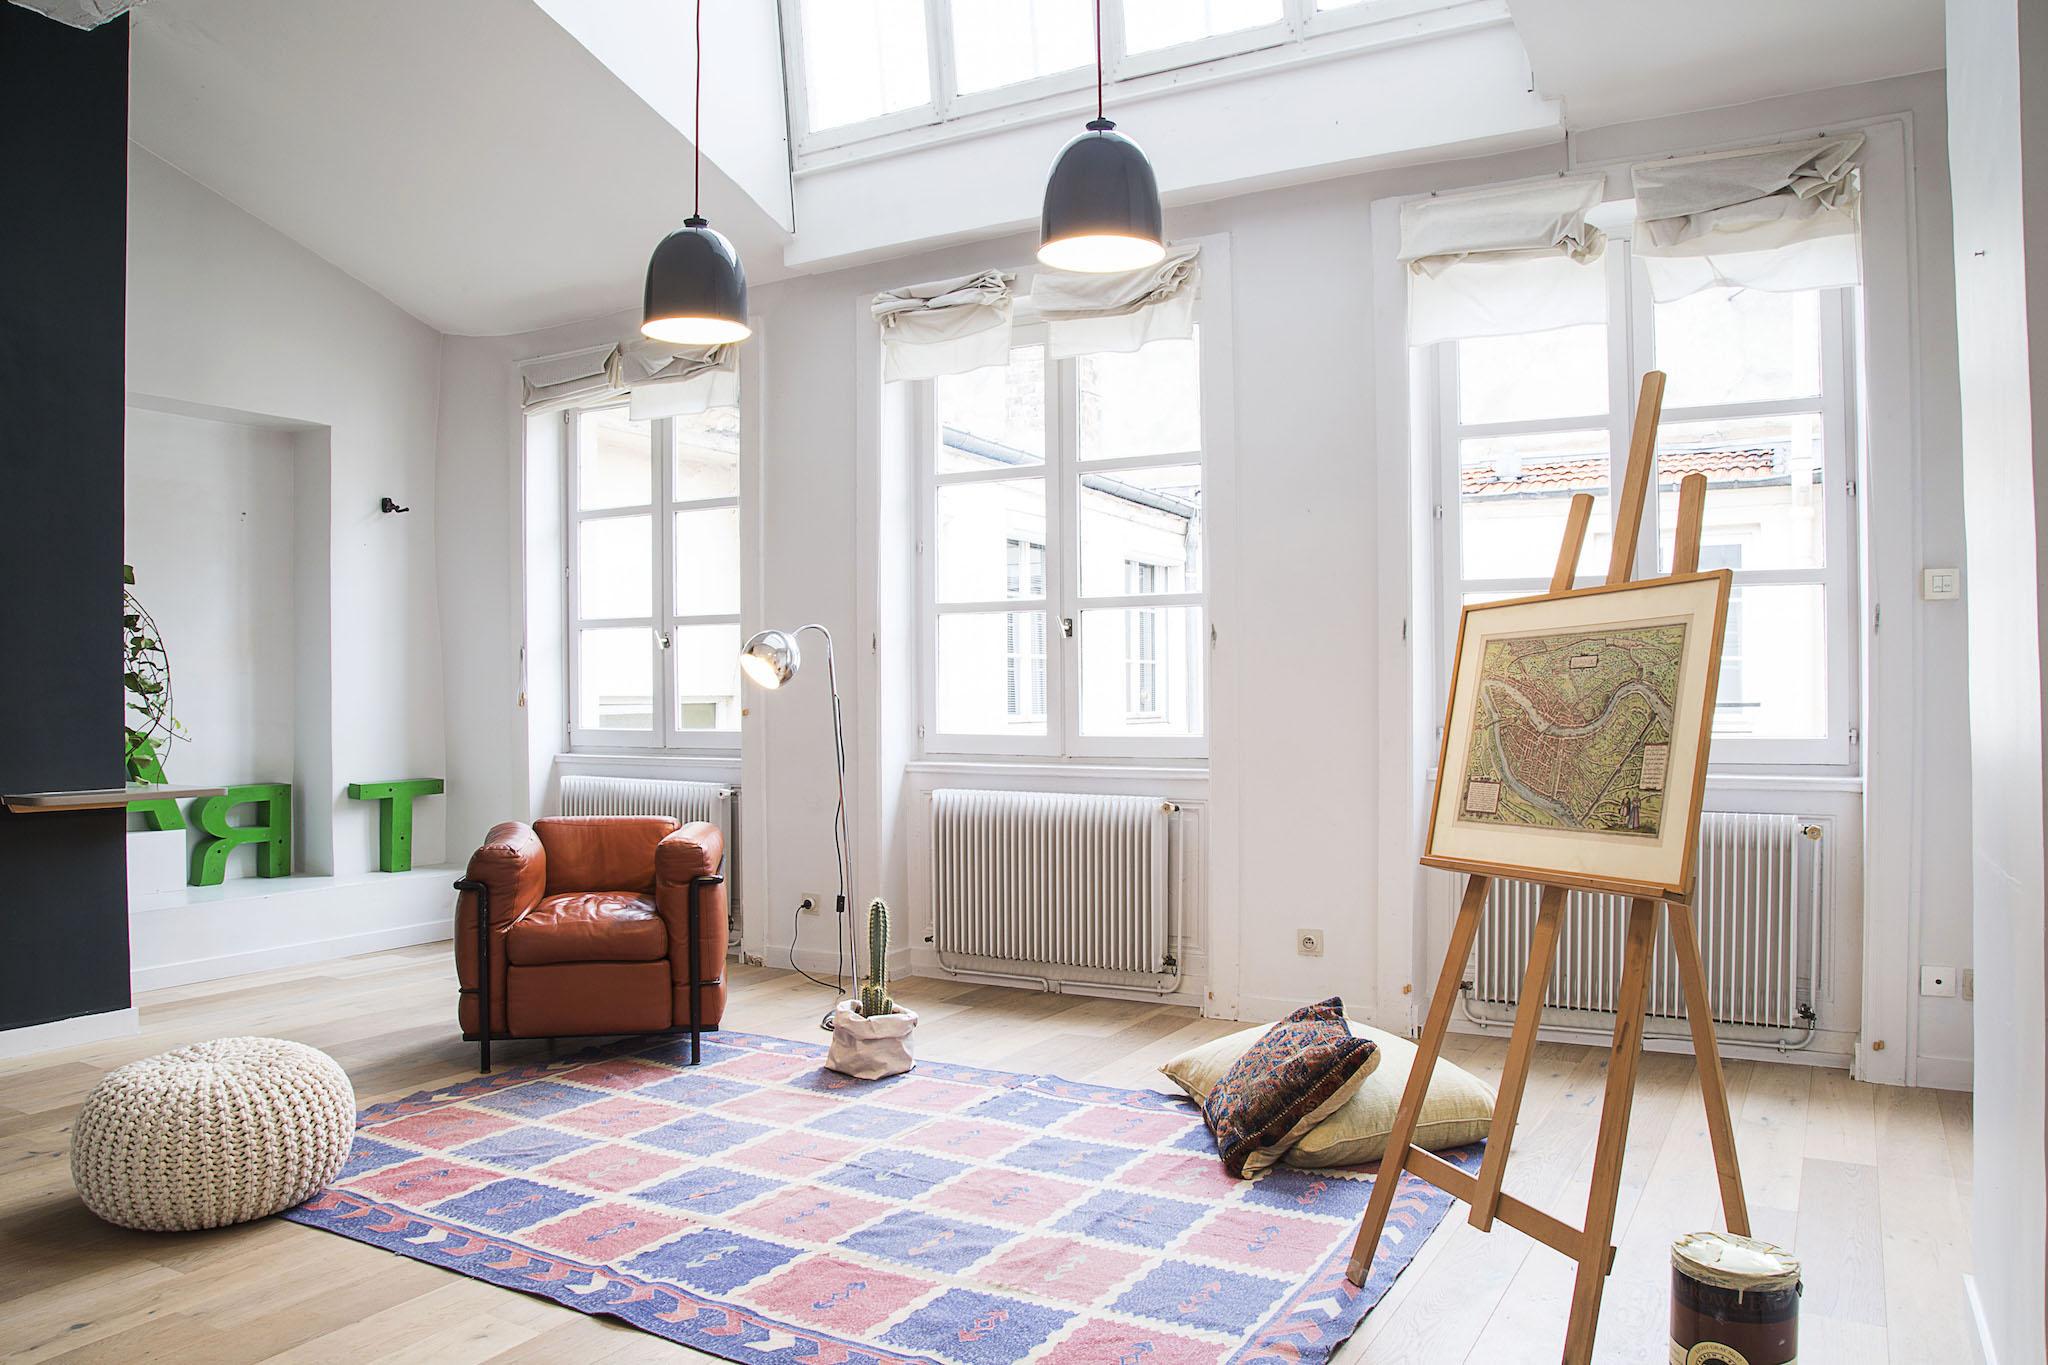 bumper-immobilier-place-tolozan-opera-690016 copie.jpg